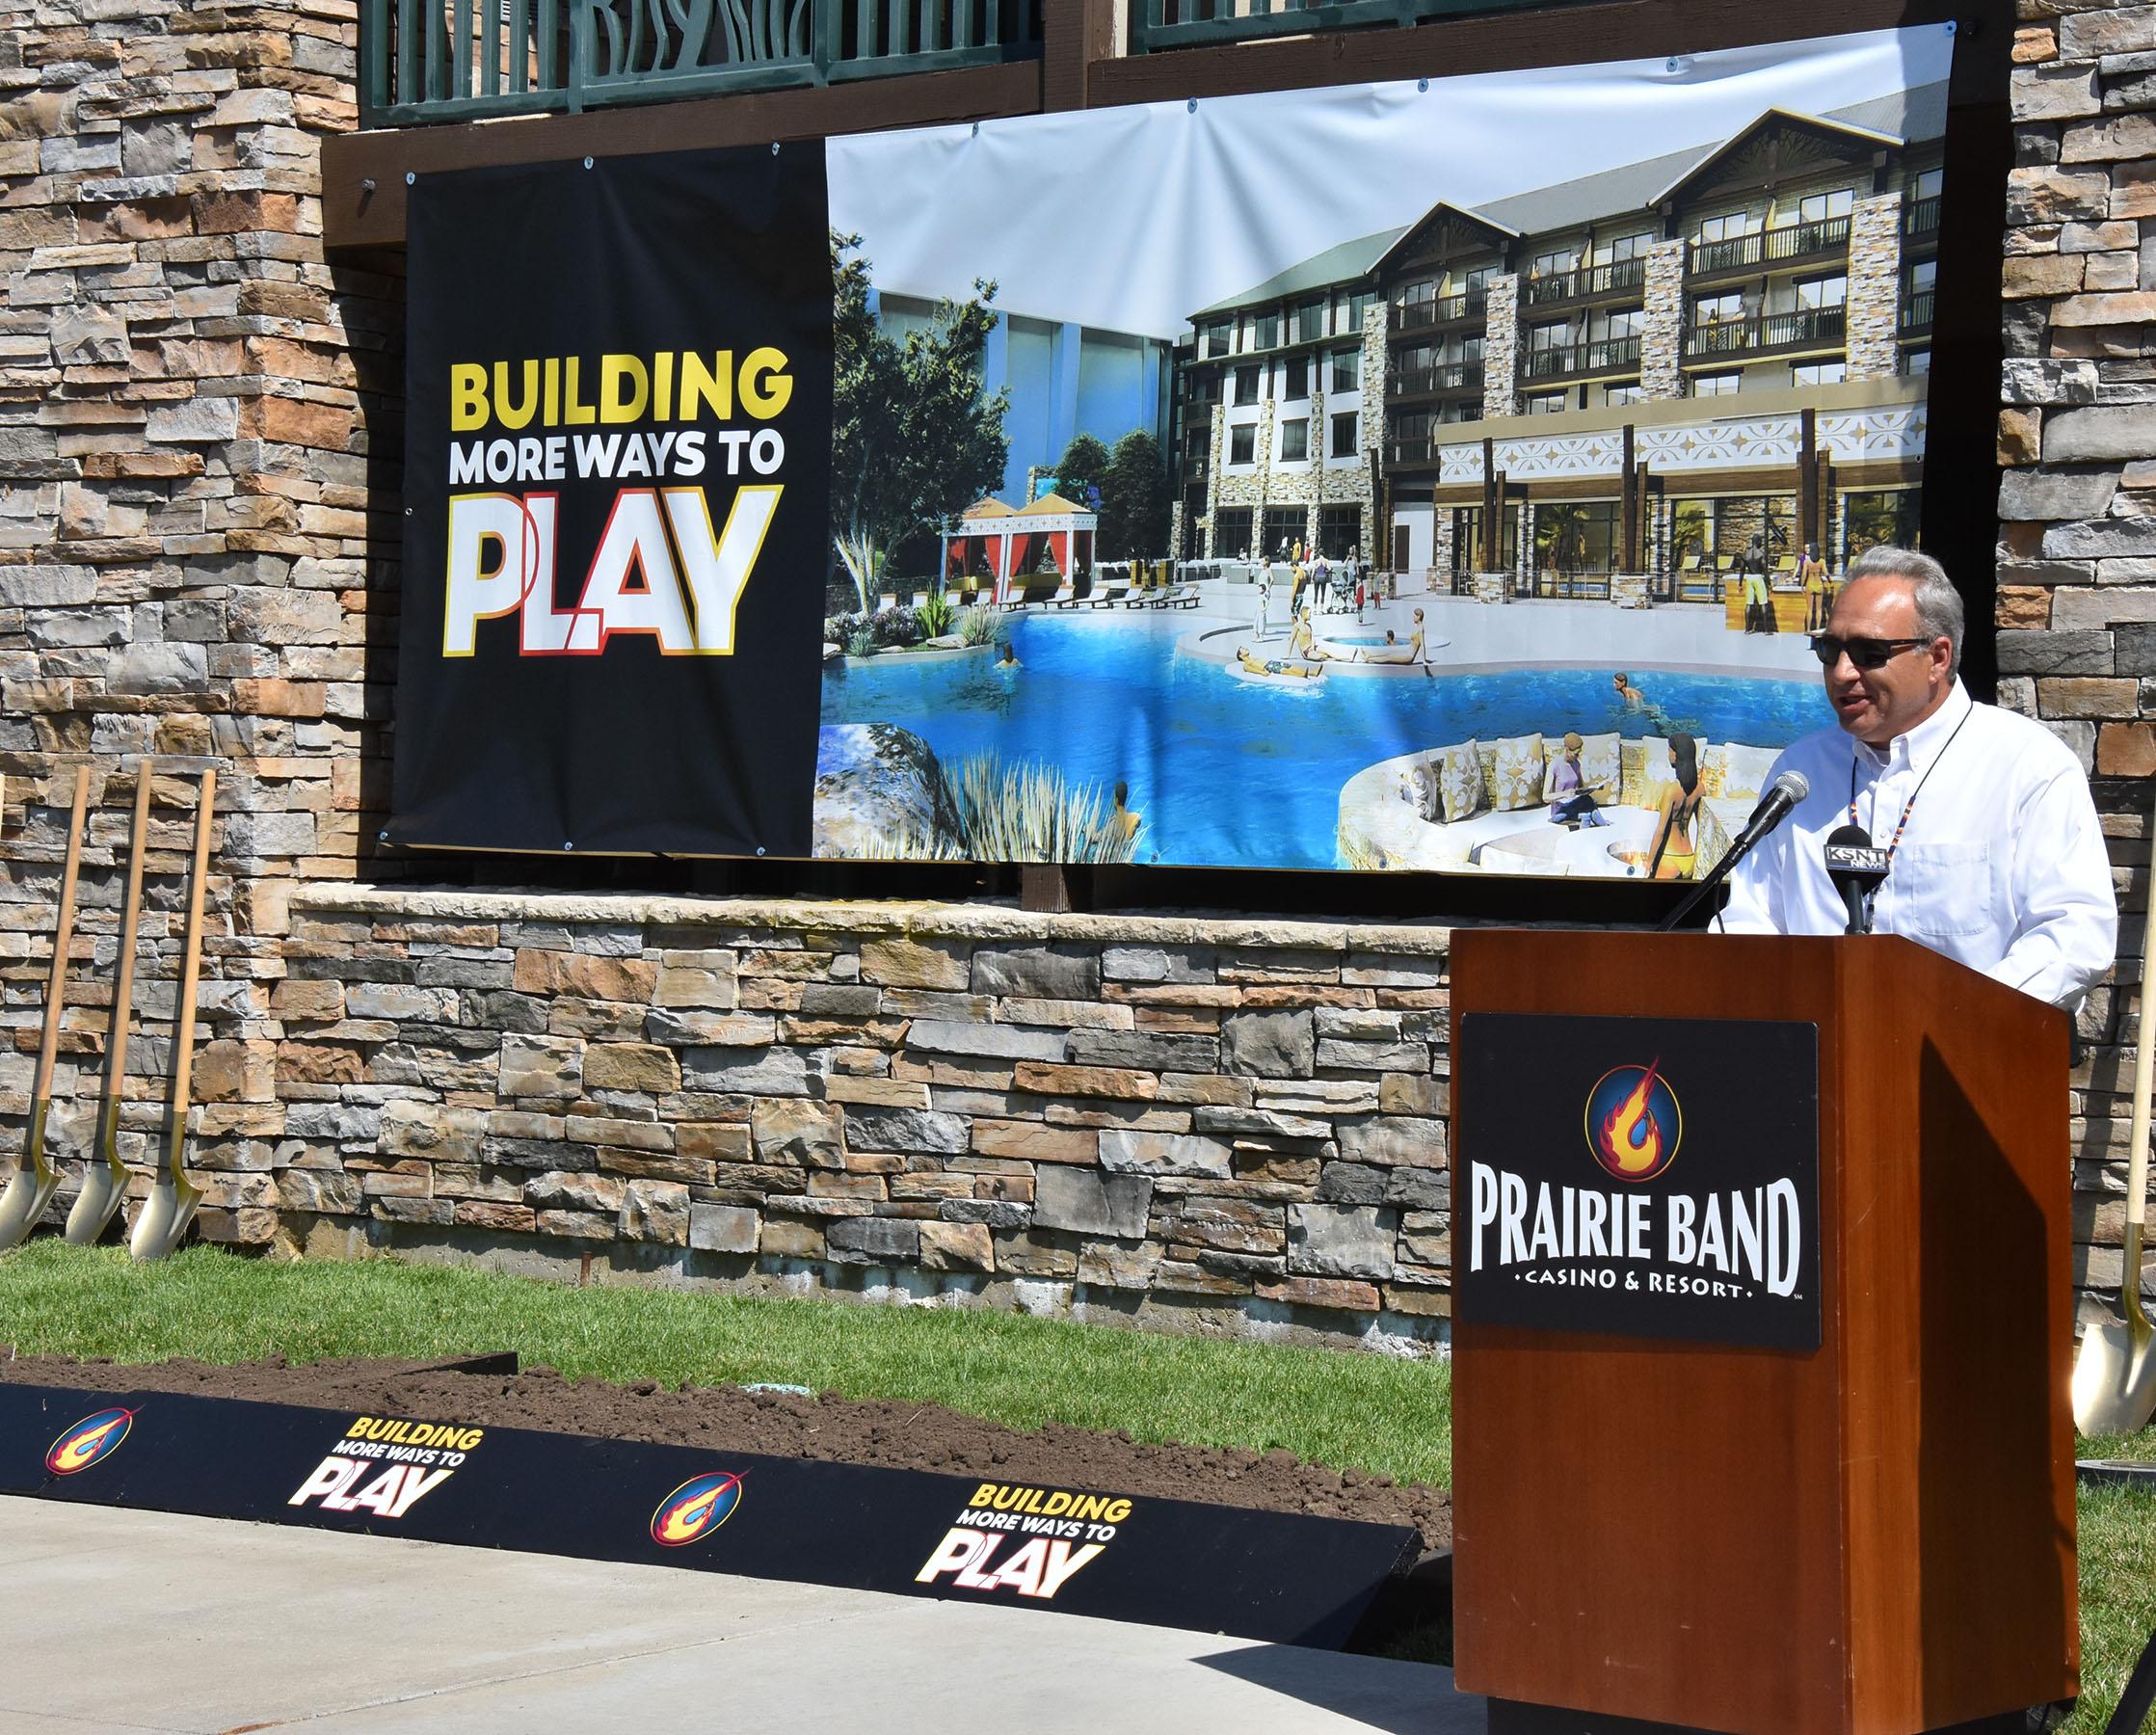 prairie band casino remodel renovation expansion